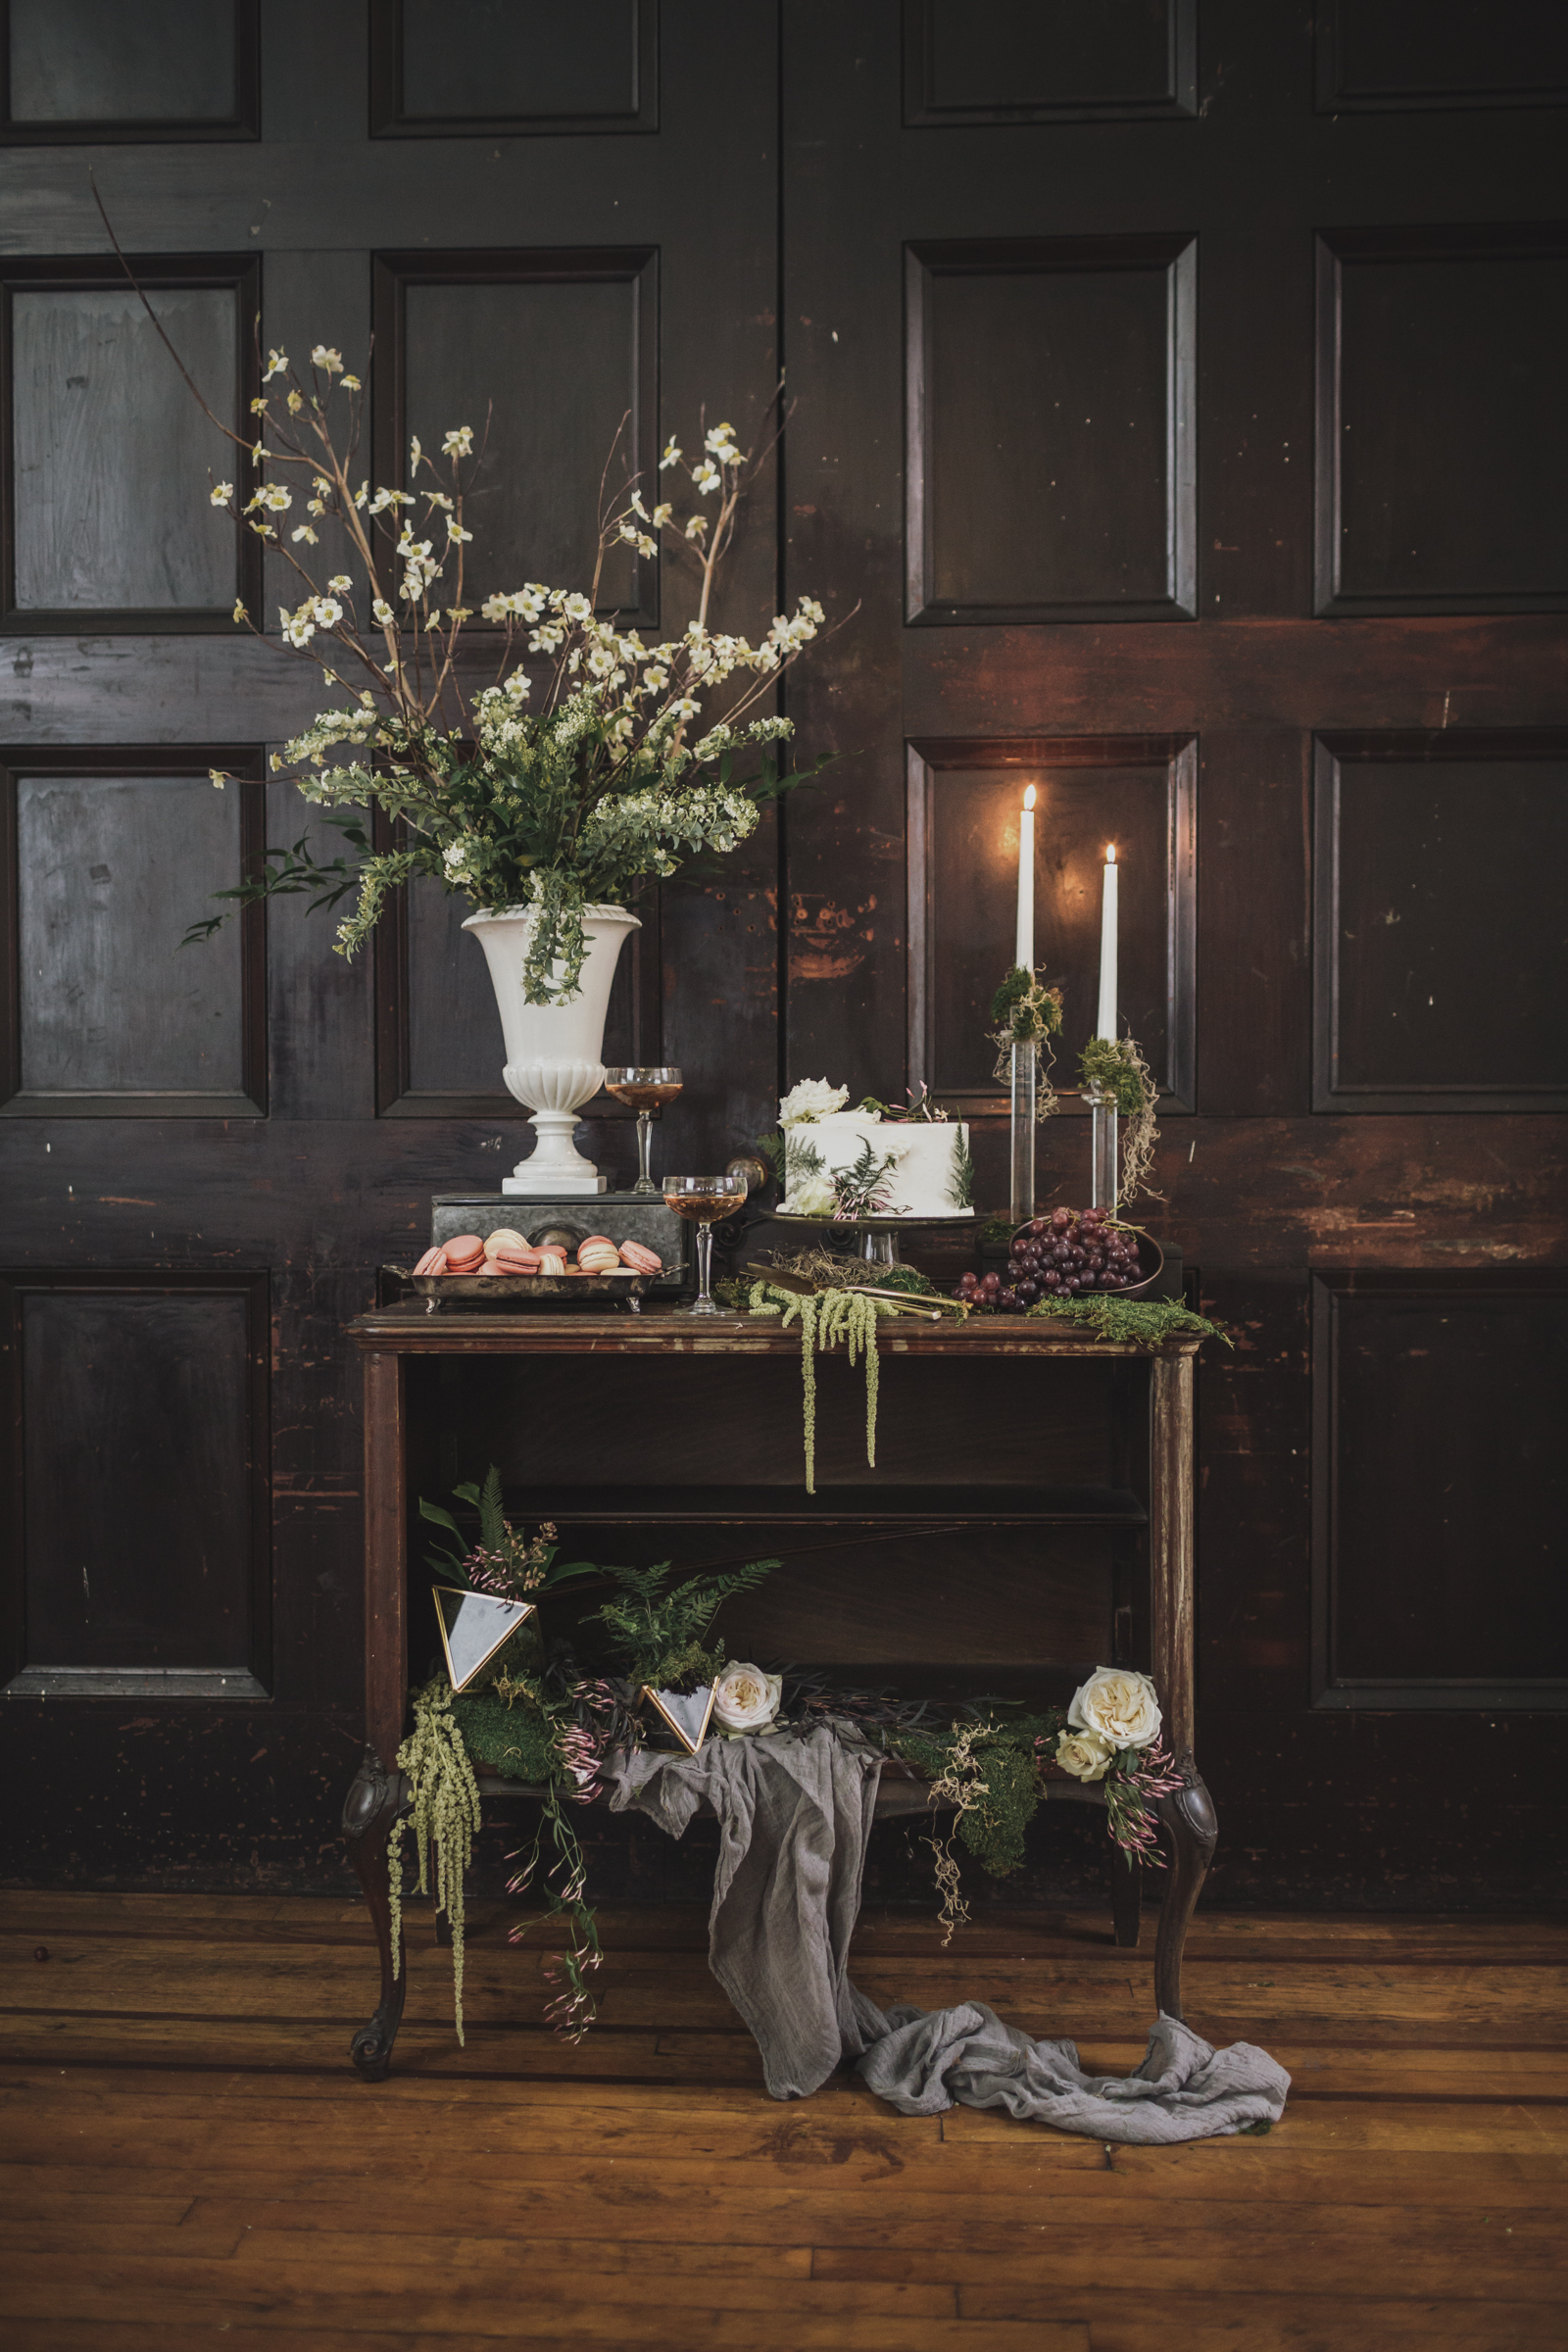 20160310-152-Barrow_Mansion_Wedding_Editorial.jpg